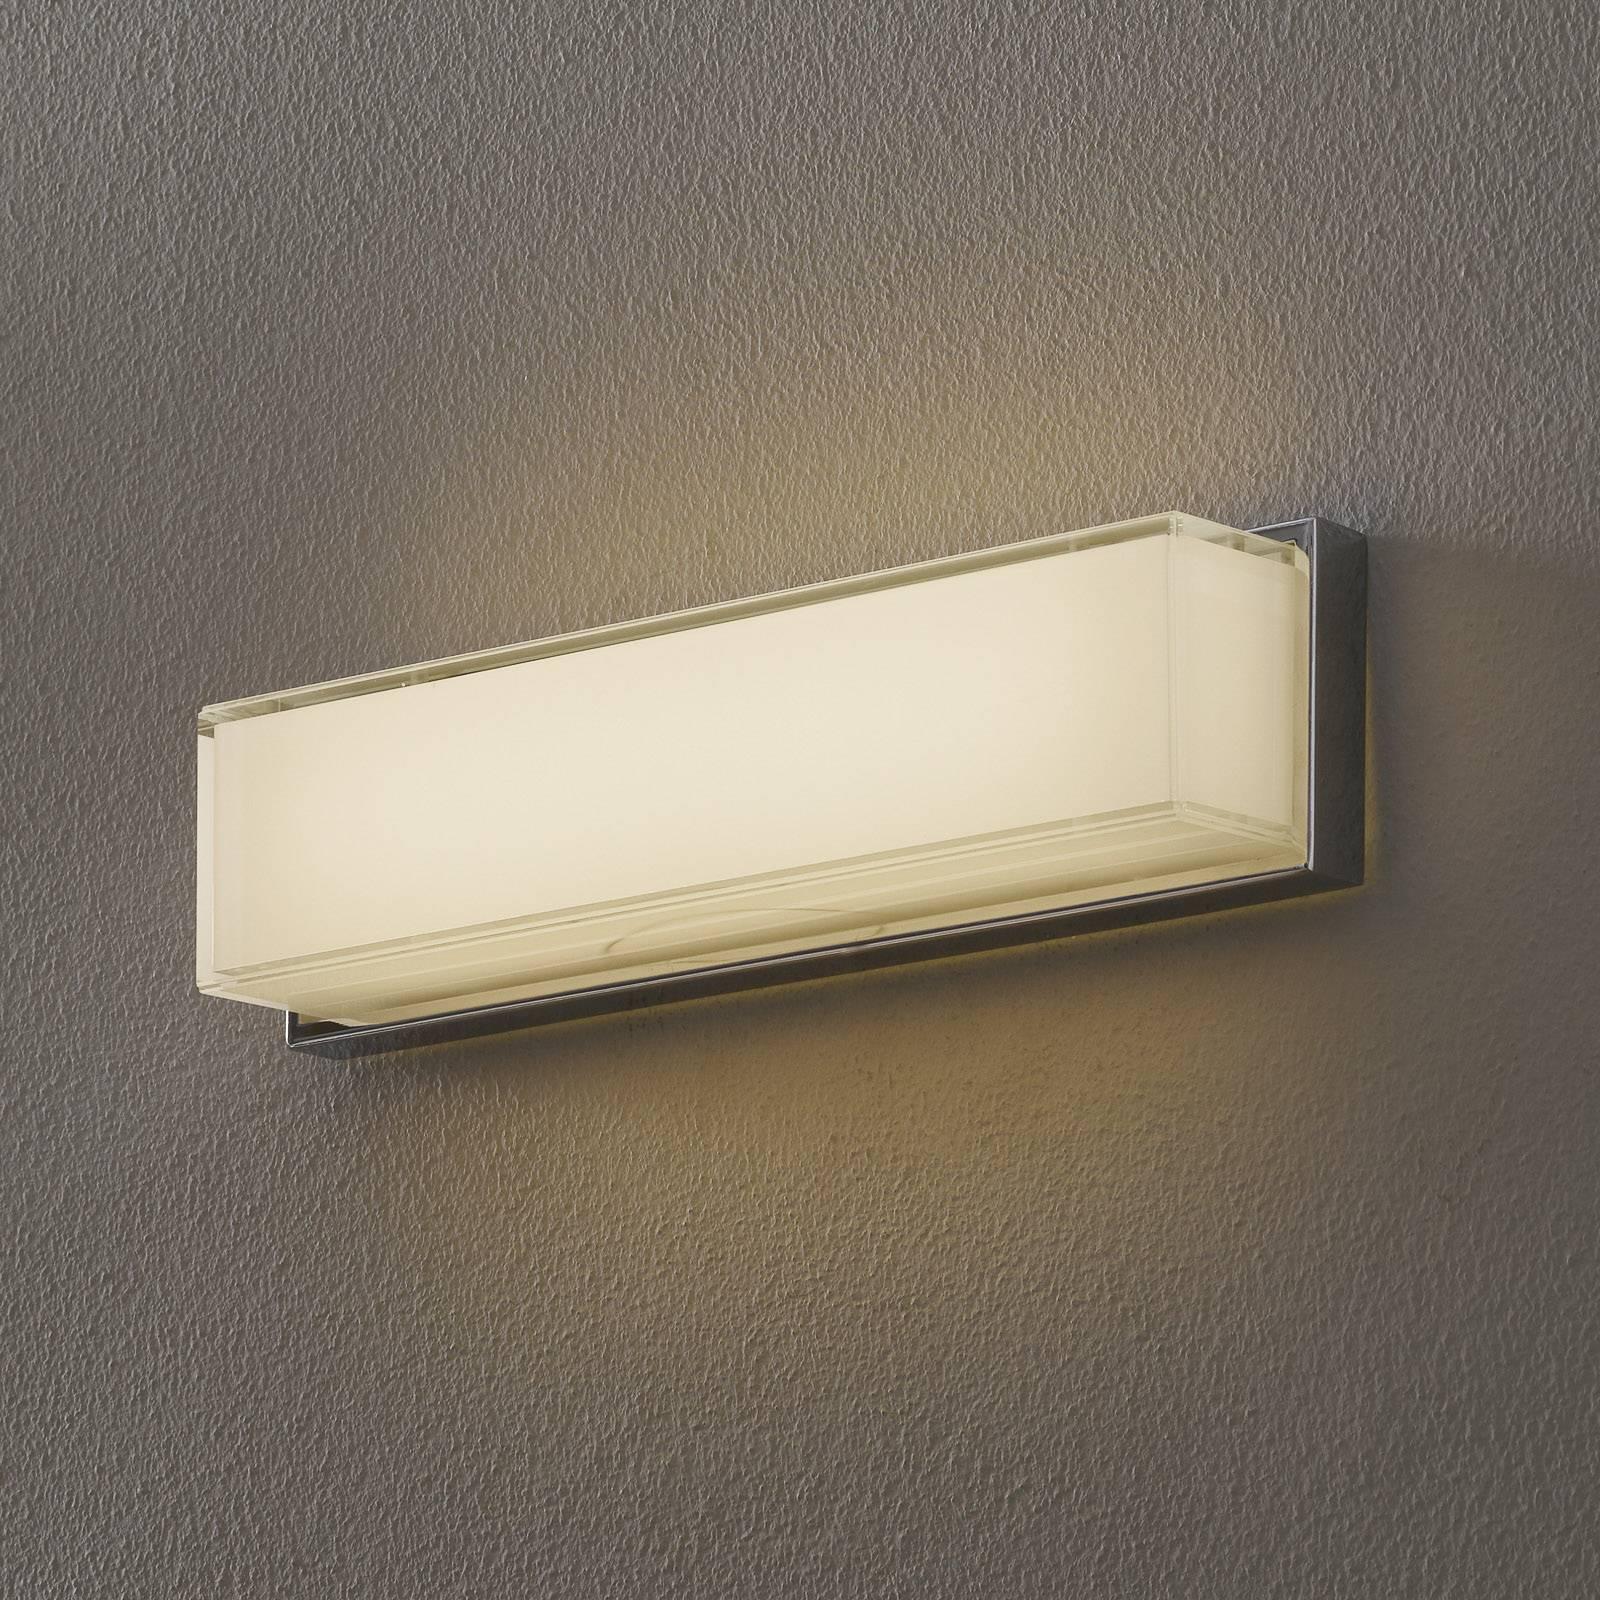 Helestra Cosi -LED-seinävalaisin kromi, K 31 cm